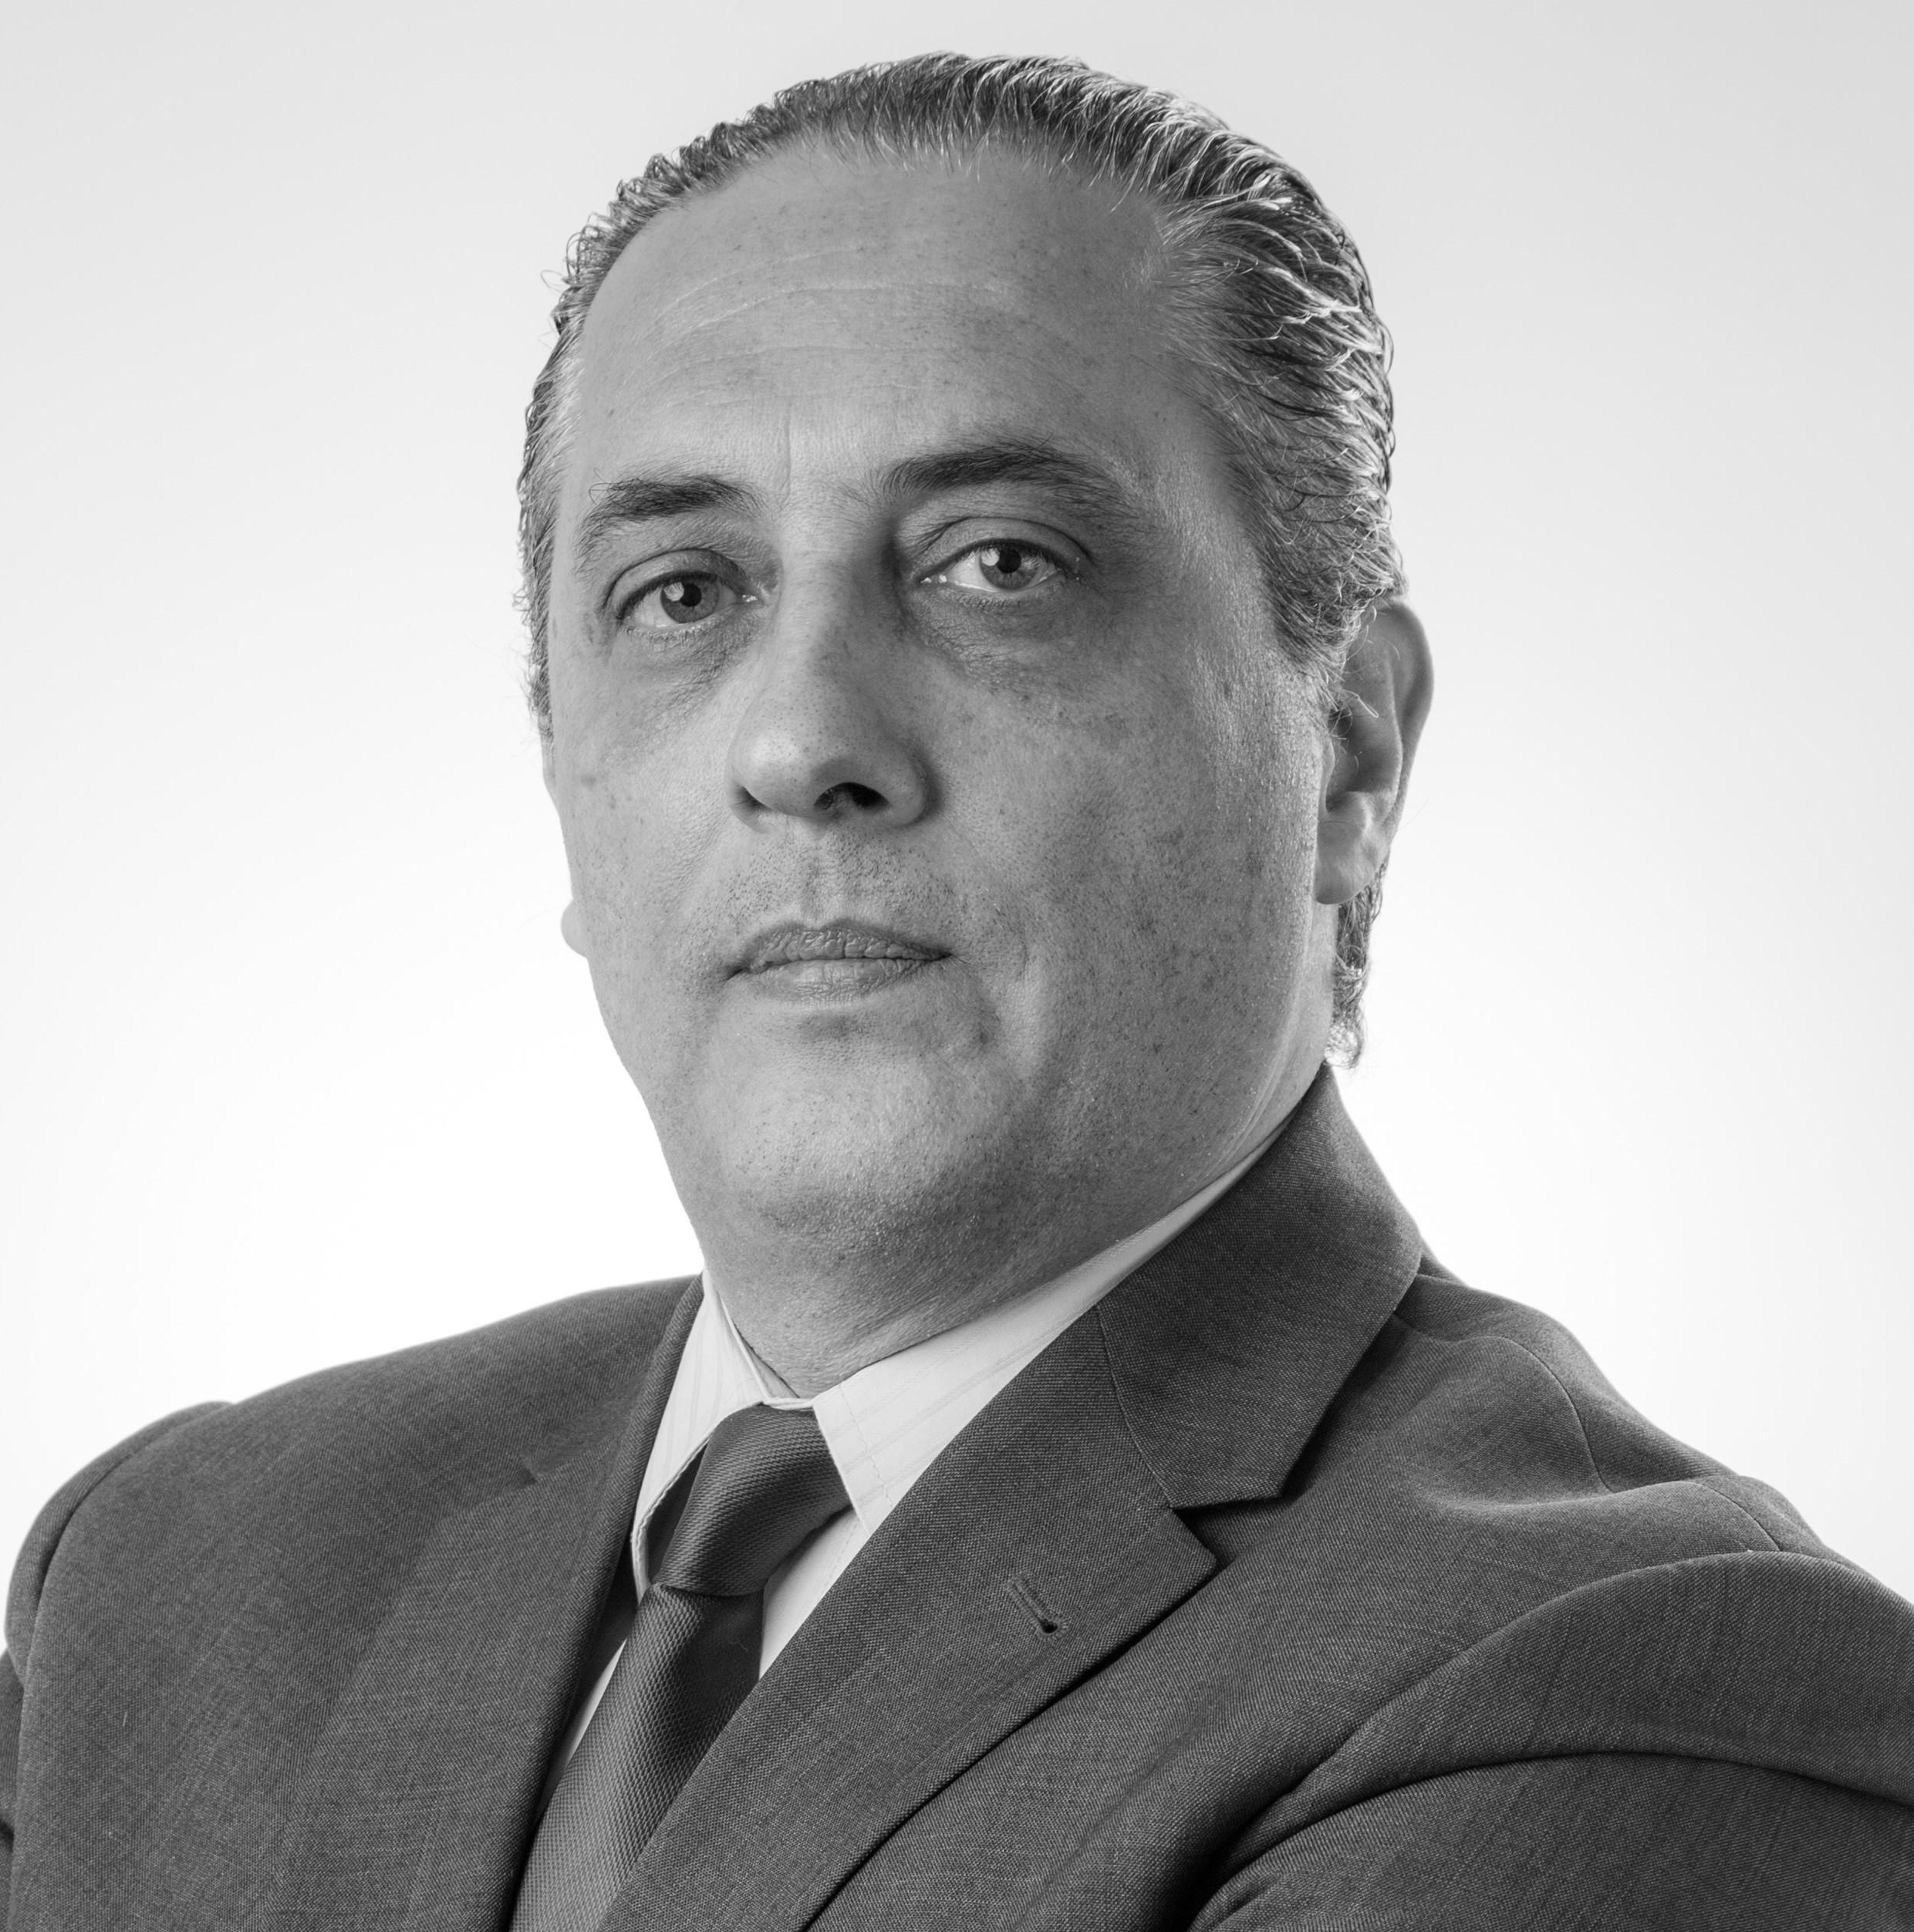 Carmine Procaccini